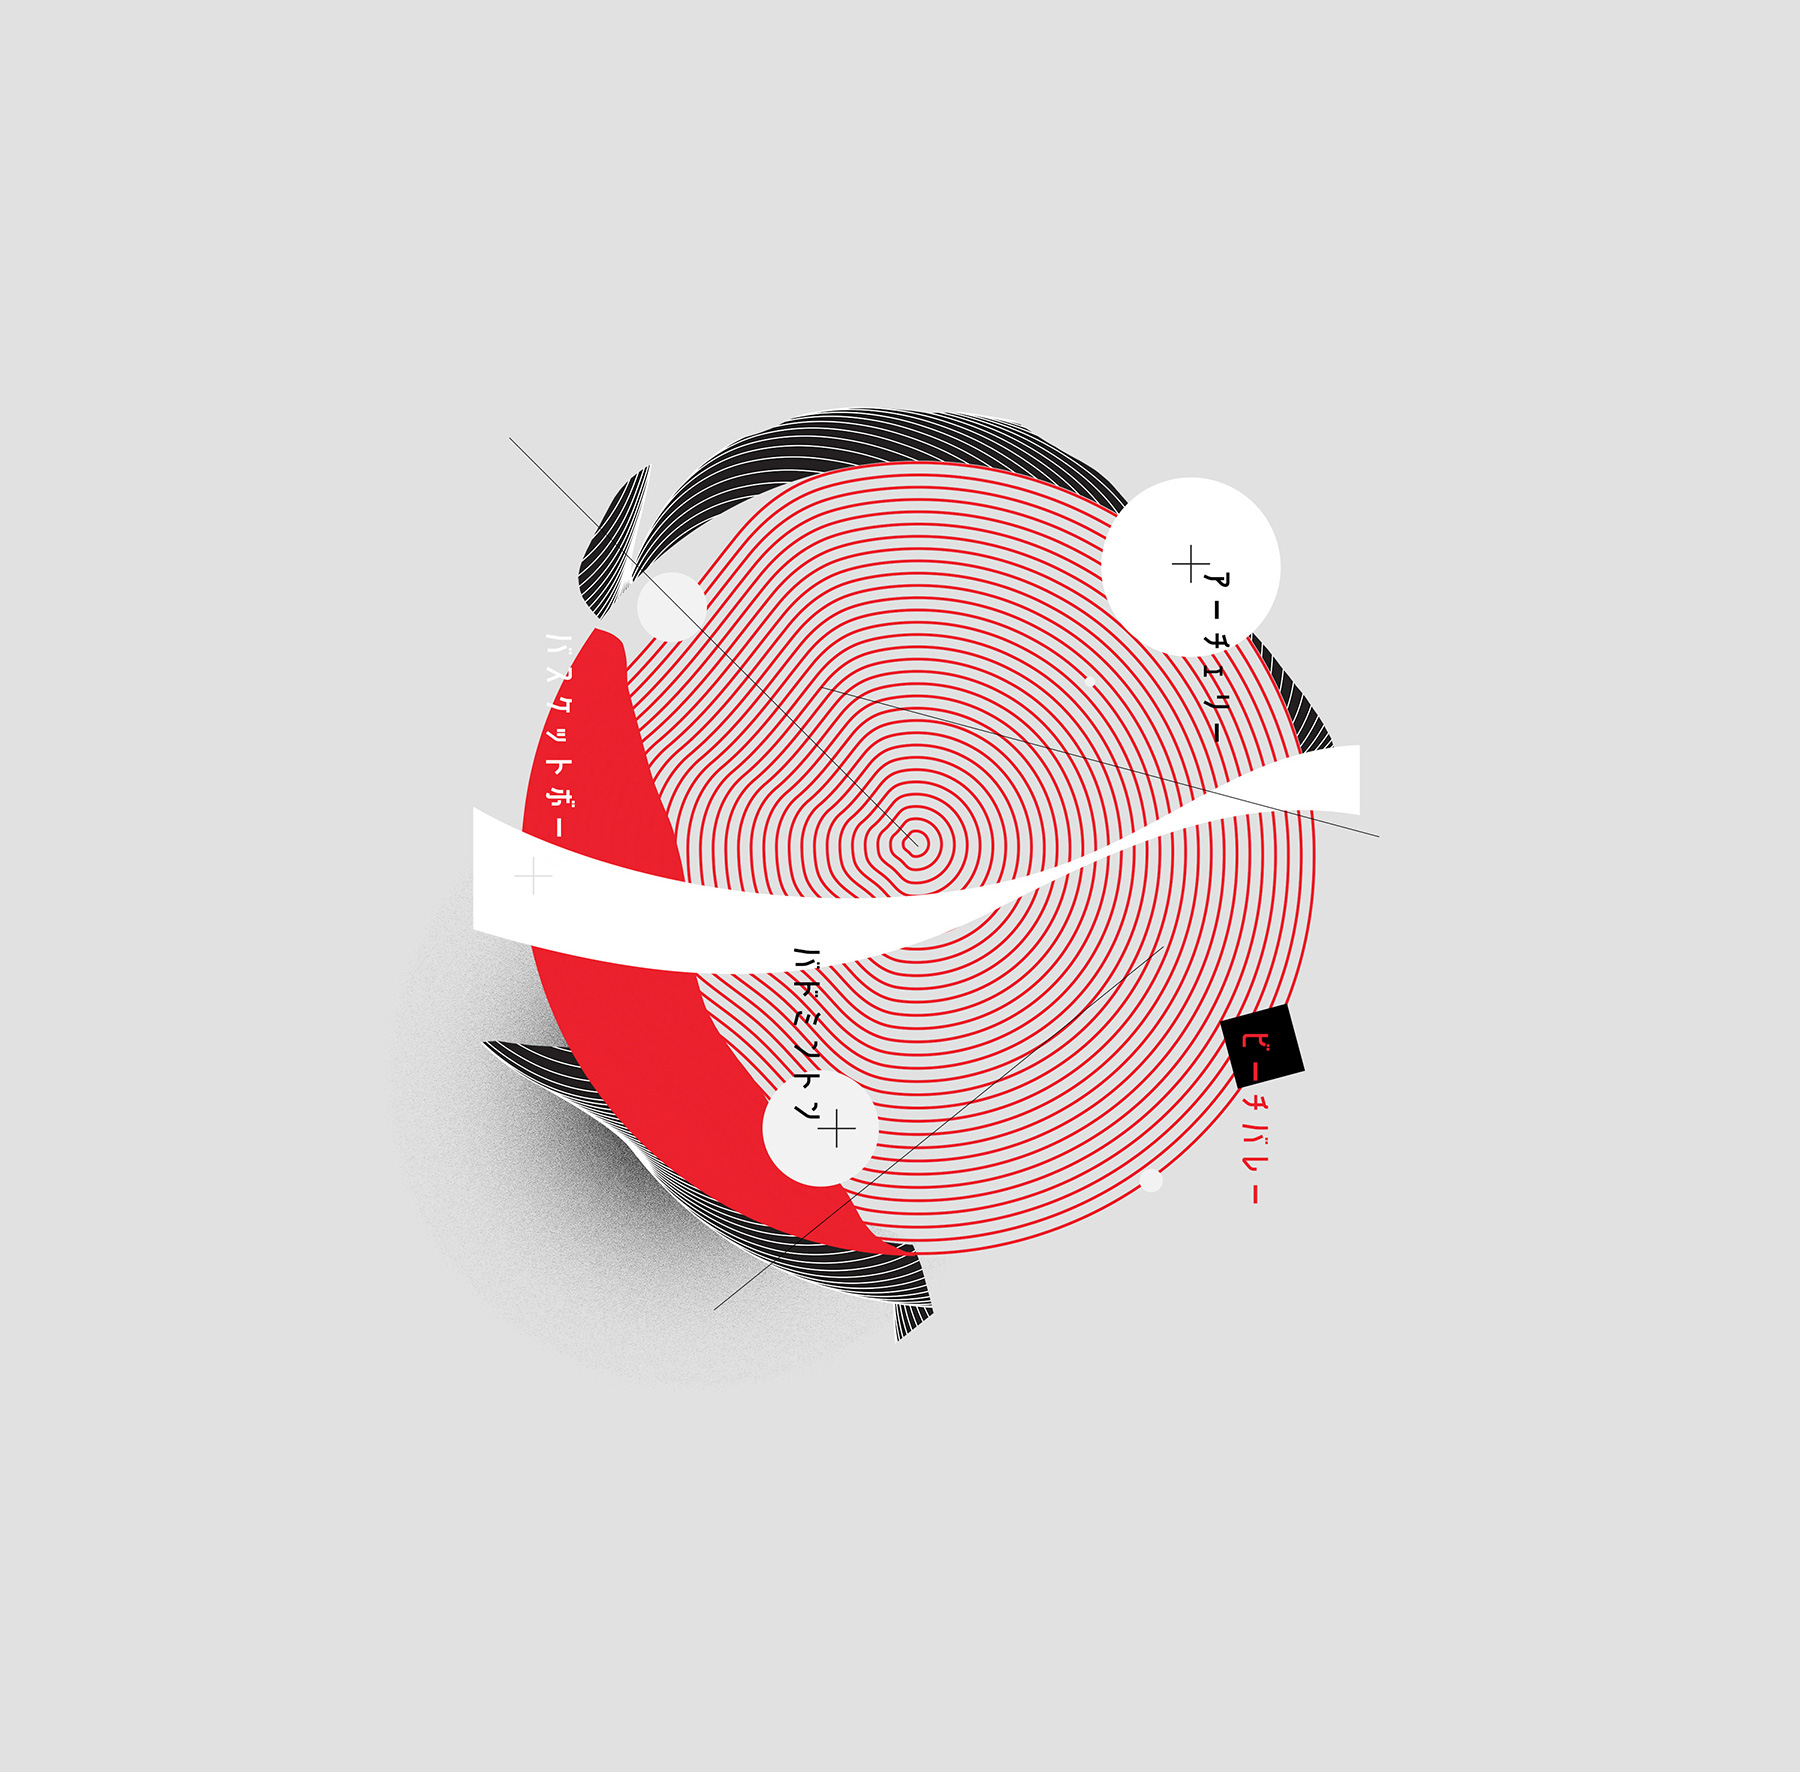 Coca-Cola x Adobe Collaboration by Vasjen Katro